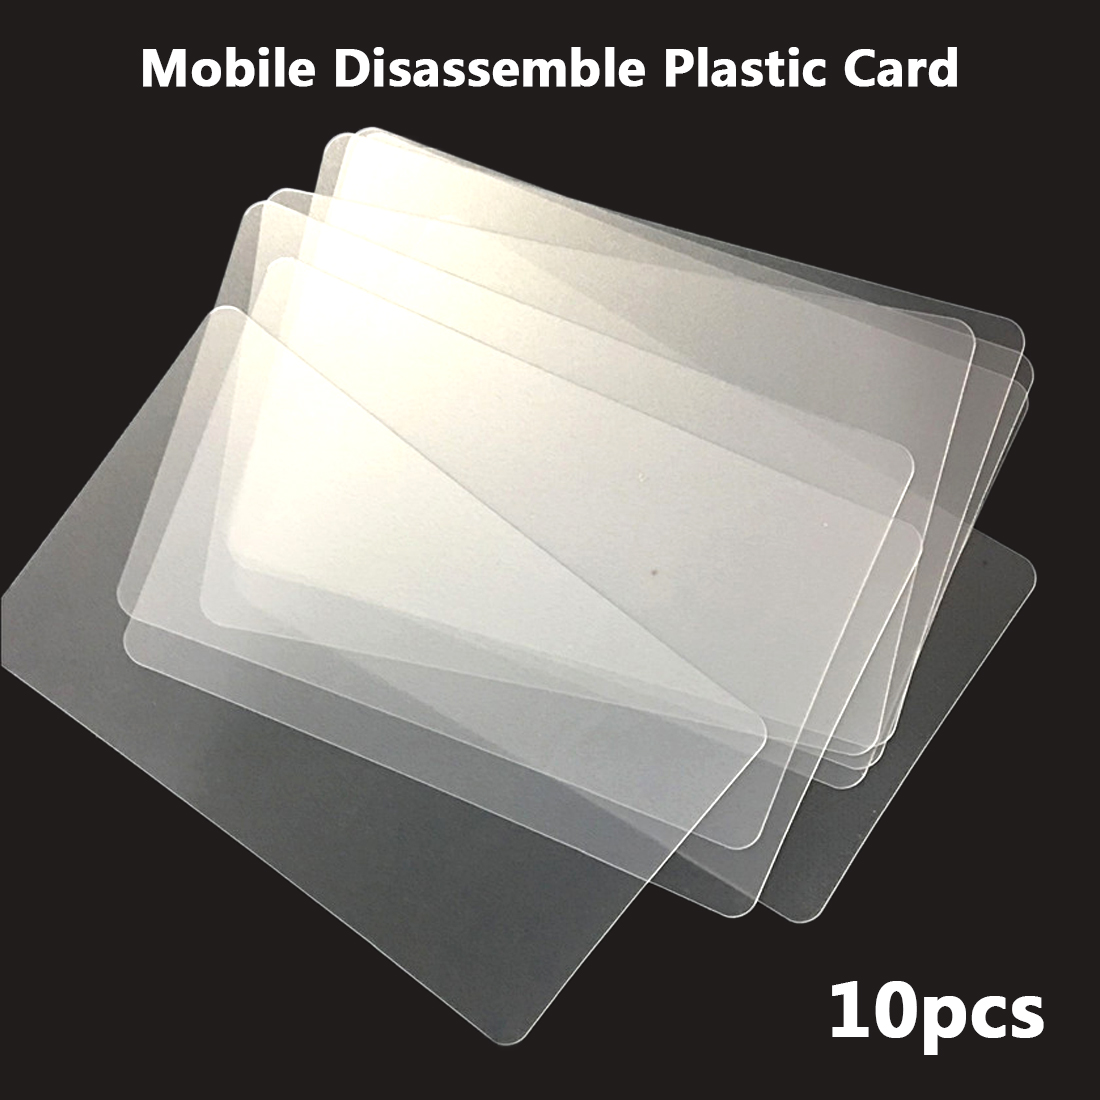 Repair Tool 10pcs Handy Plastic Card Pry Opening Scraper For IPhone IPad Tablet For Samsung Mobile Phone Glued Screen Hand Tools